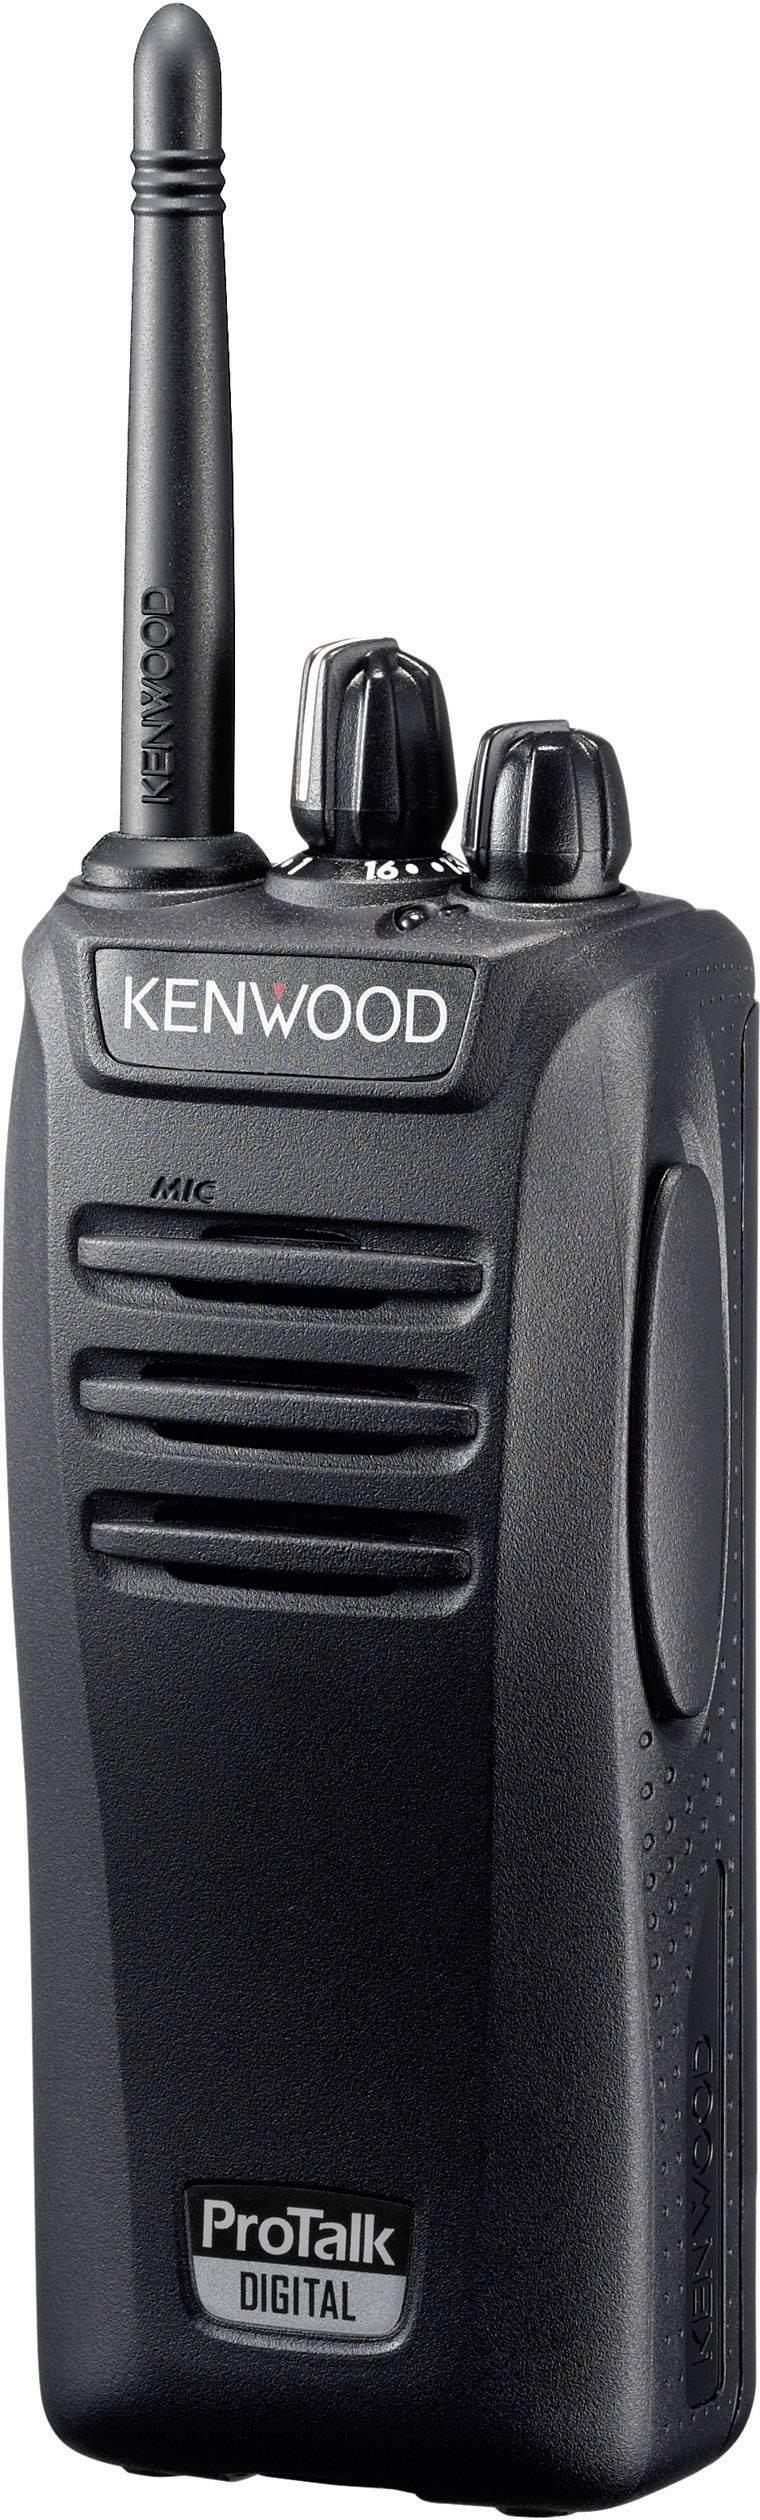 PMR rádiostanica/vysielačka Kenwood ProTalk TK-3401DE